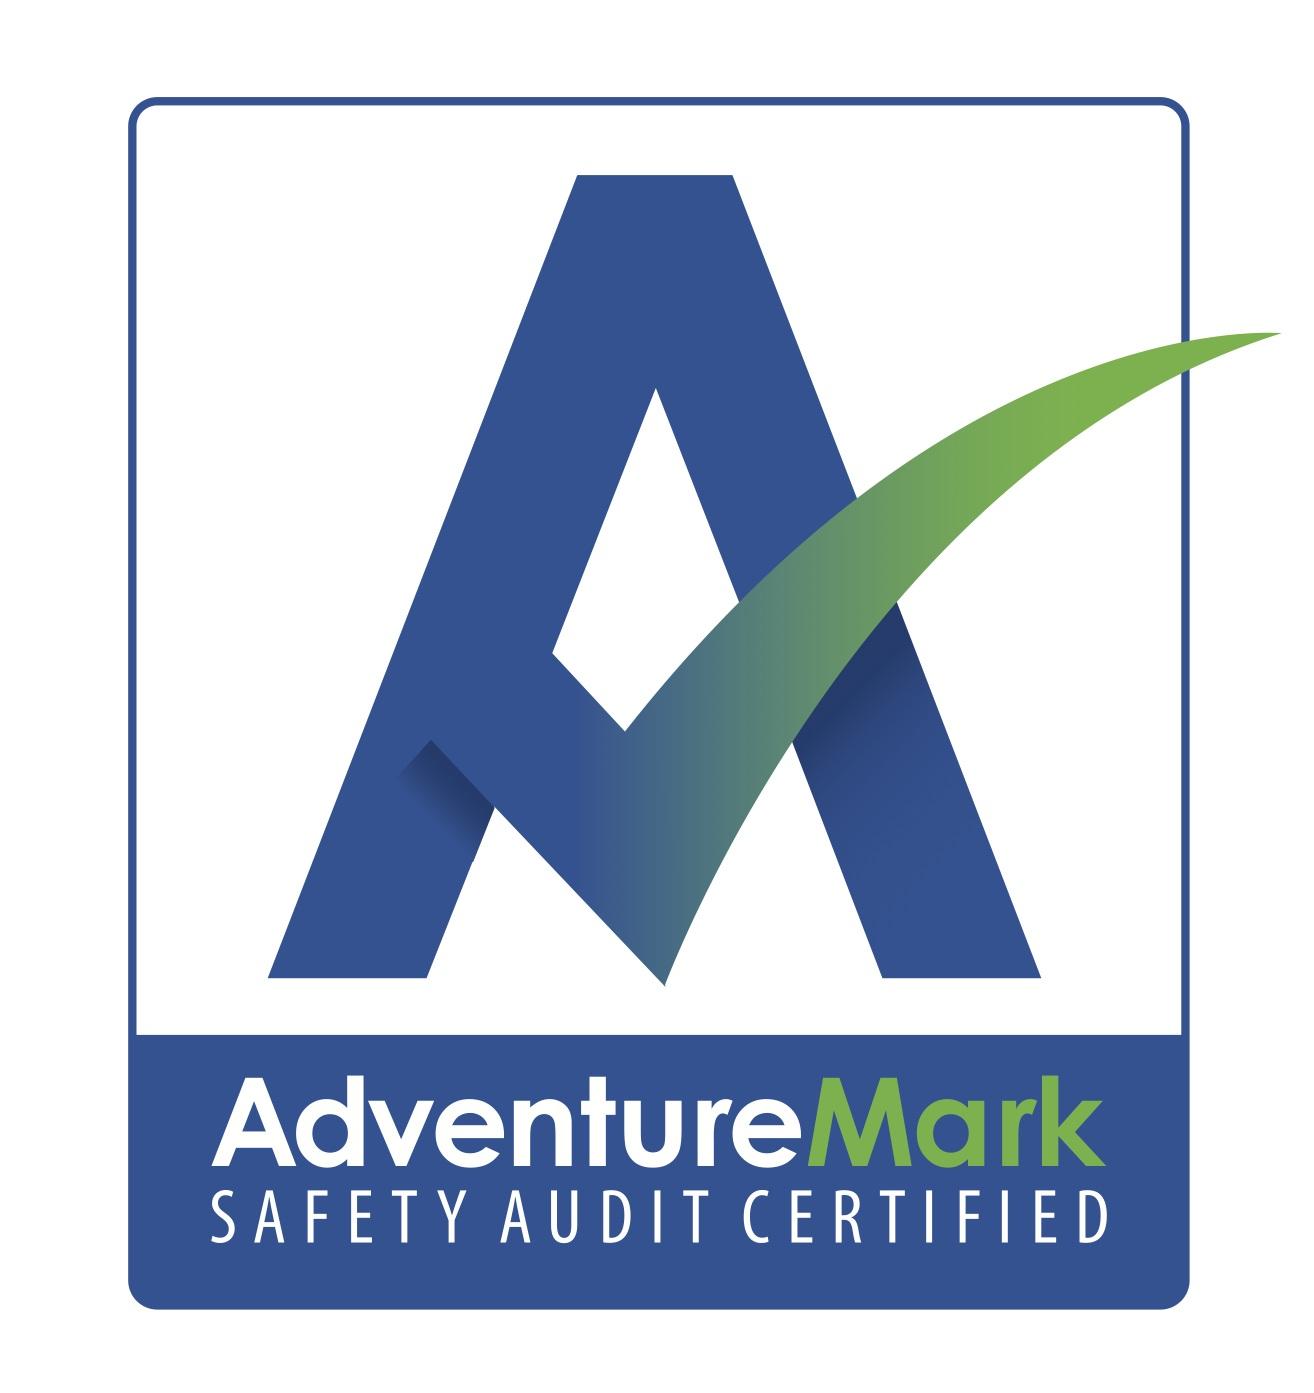 AdventureMark1sourcefile%5B1%5D.jpg